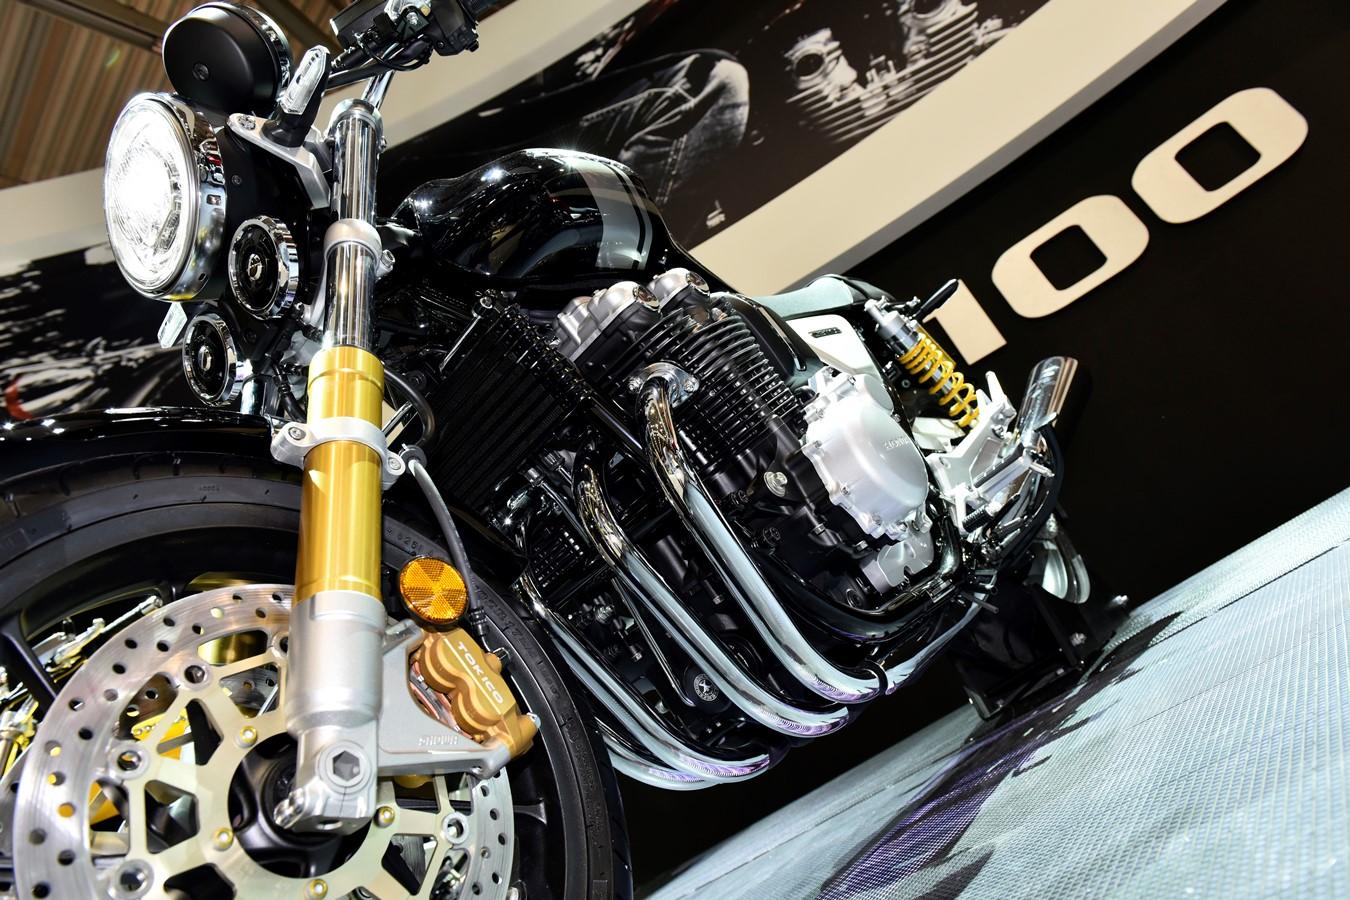 2017 Cb1100 Rs Honda Cb750 Engine Cutaway